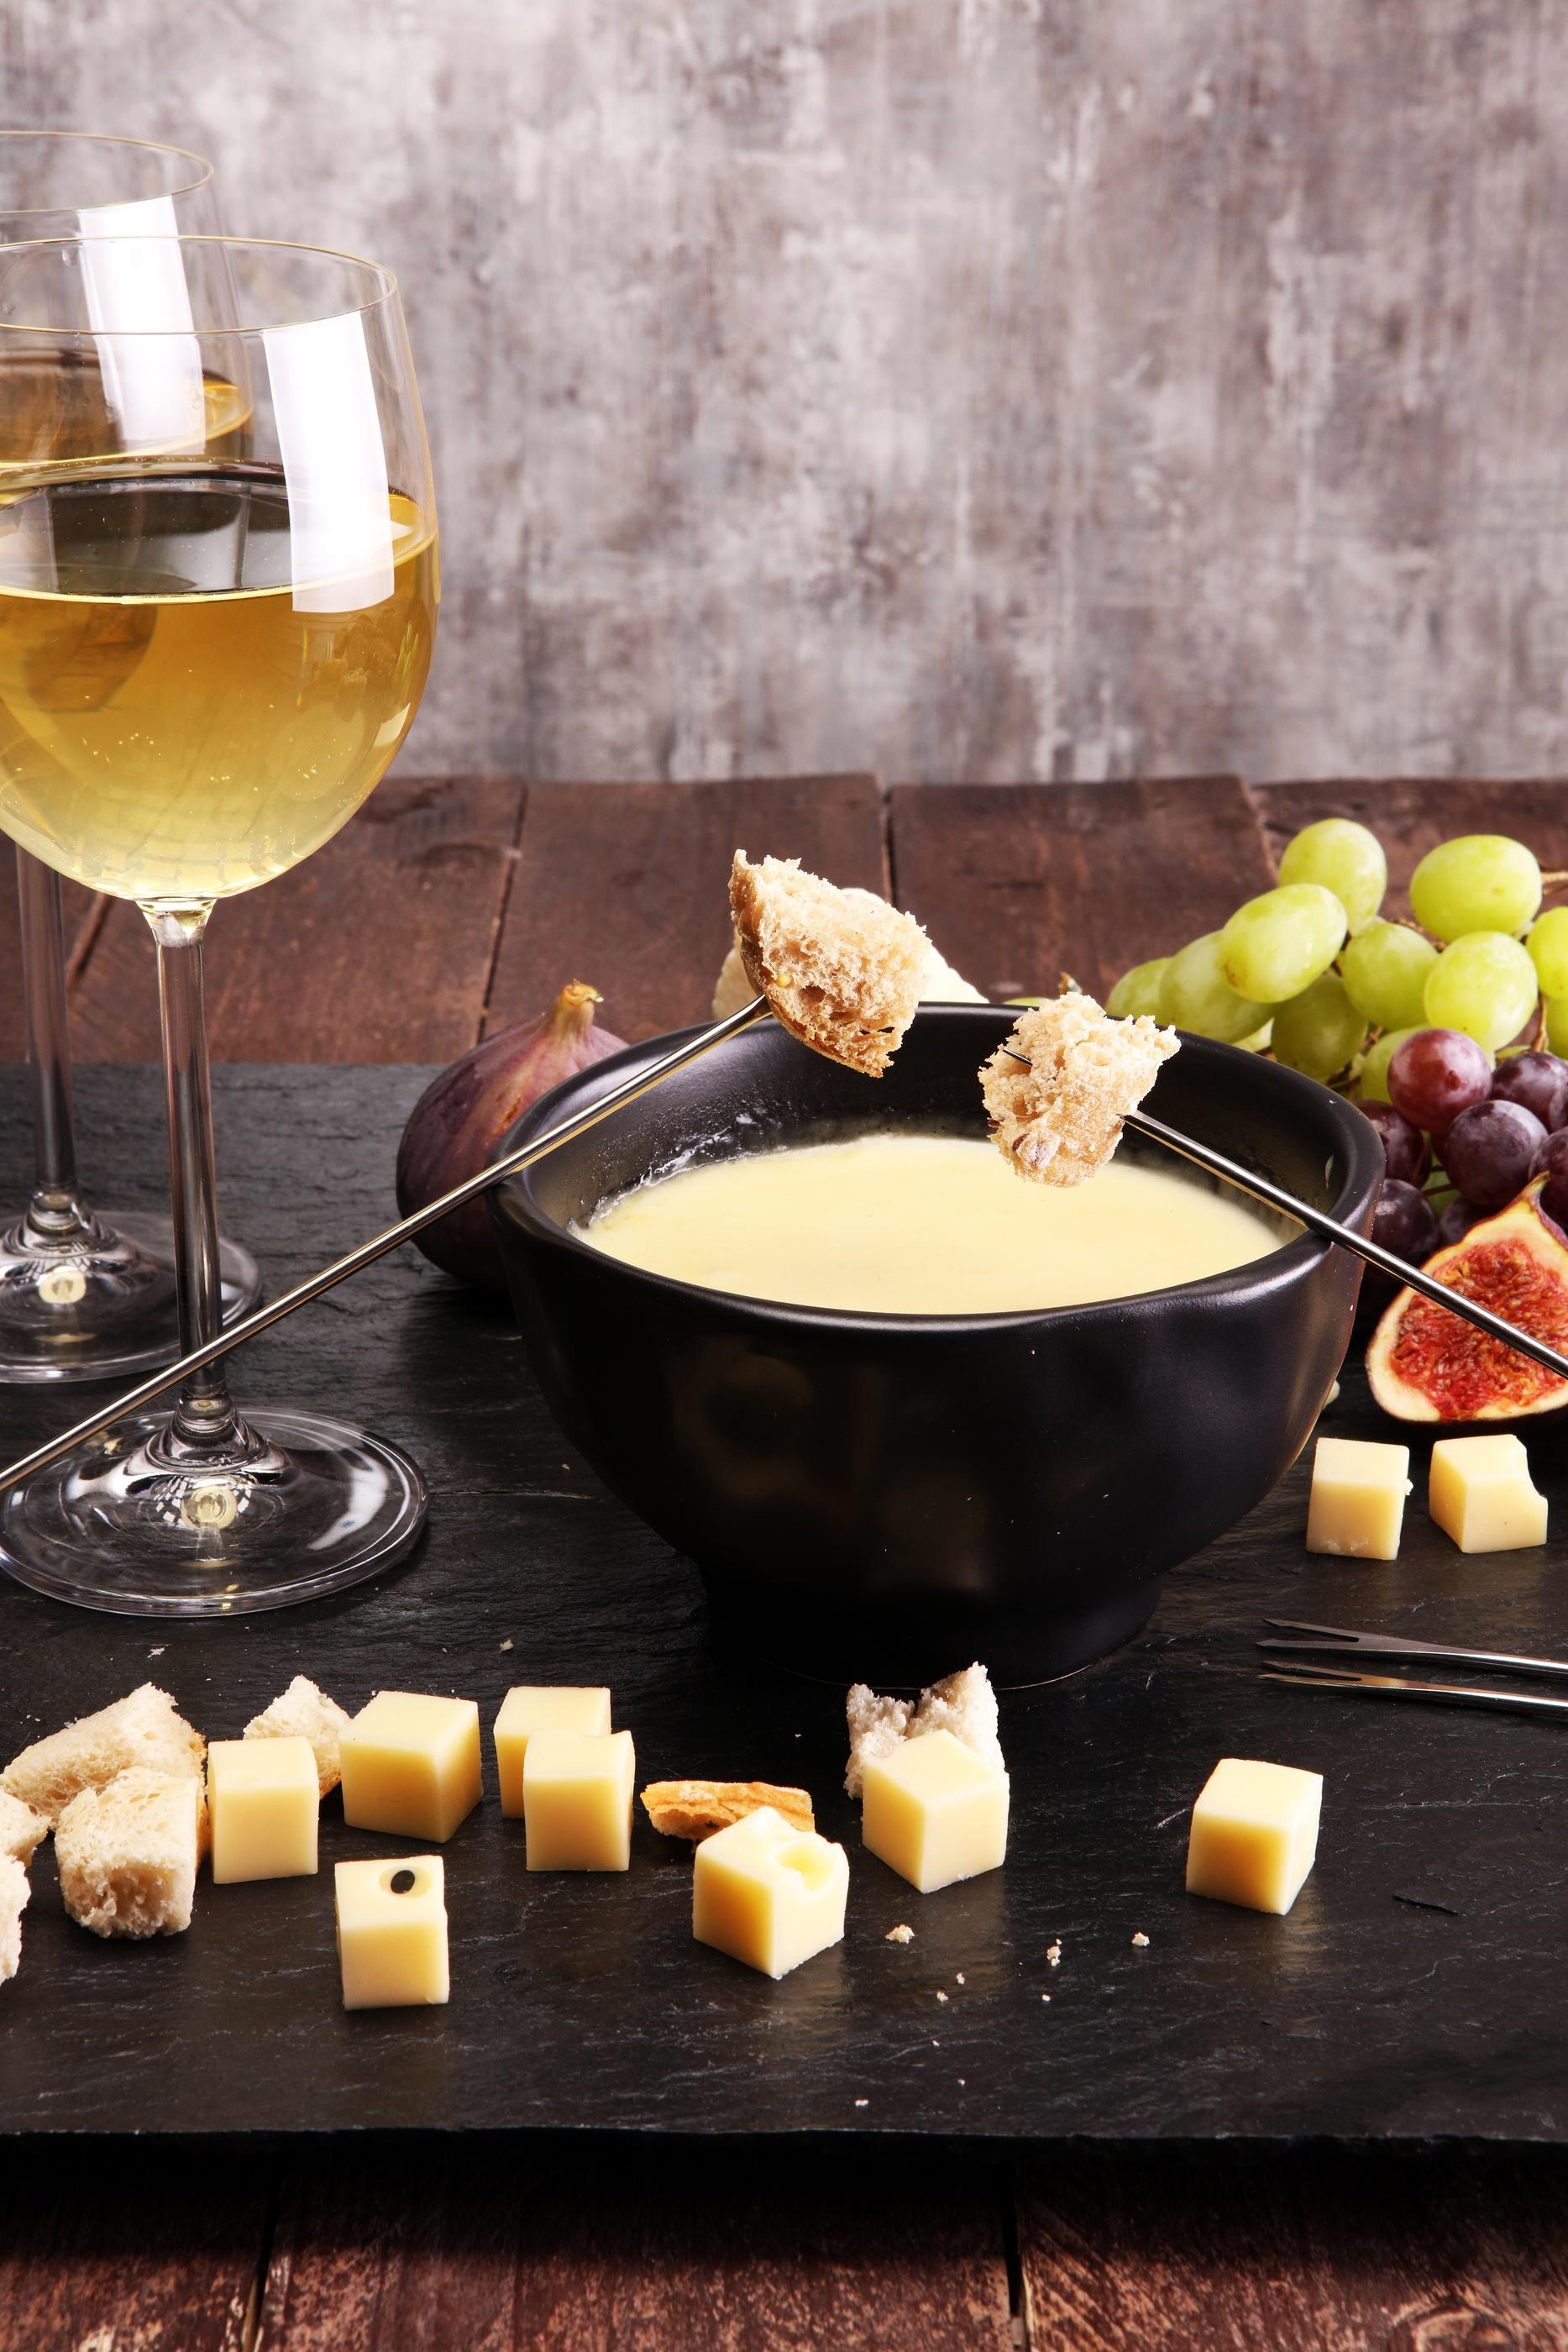 bigstock-Gourmet-Swiss-Fondue-Dinner-On-205357309.jpg